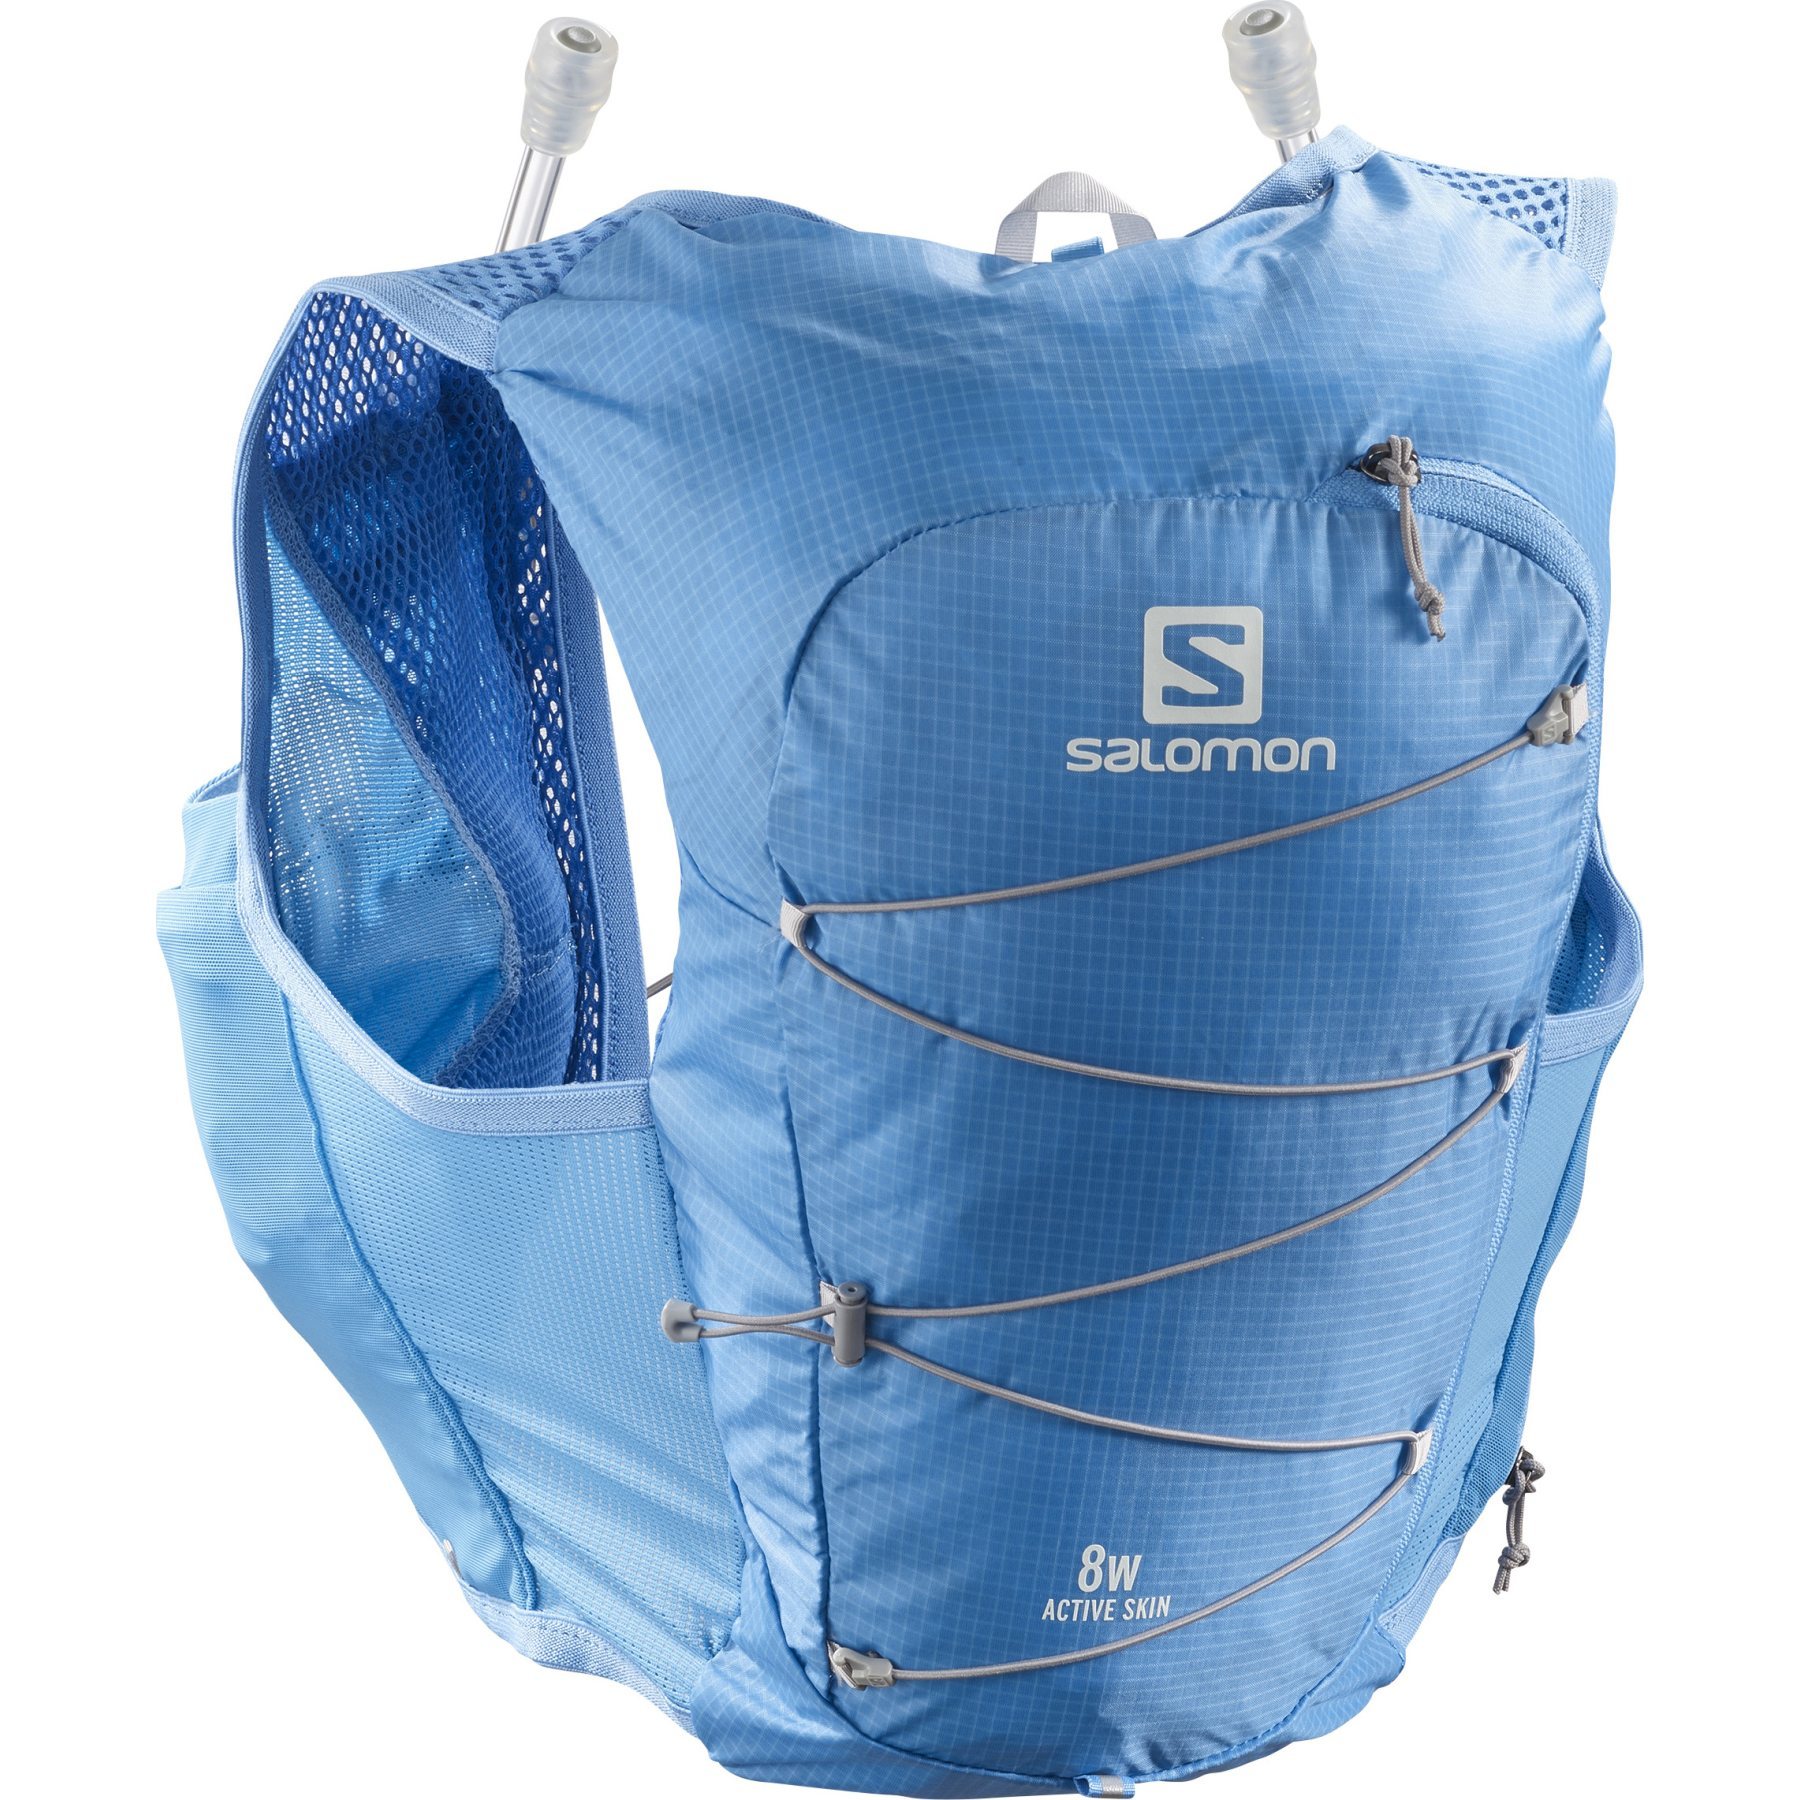 Picture of Salomon Active Skin 8 Set Women's Running Vest - marina/alloy